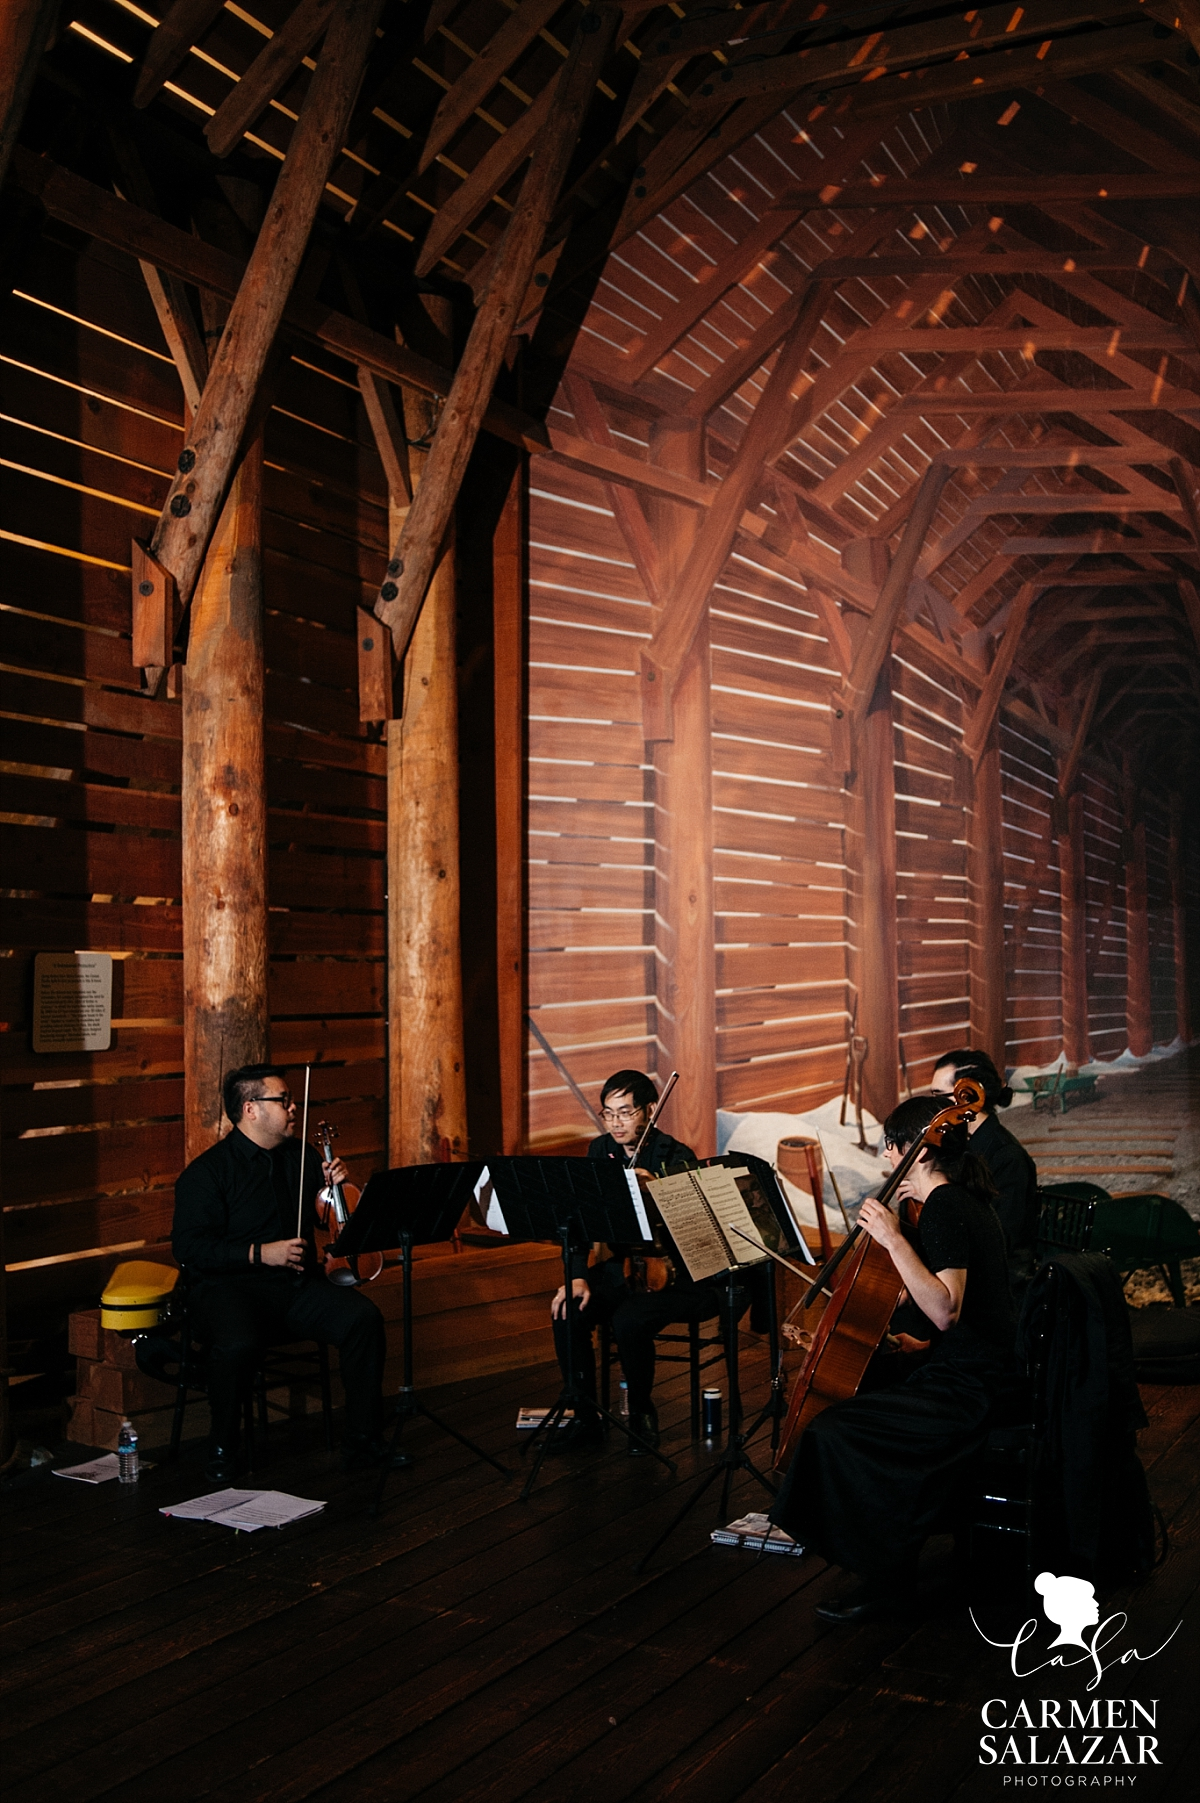 Sacramento String Quartet wedding performance - Carmen Salazar